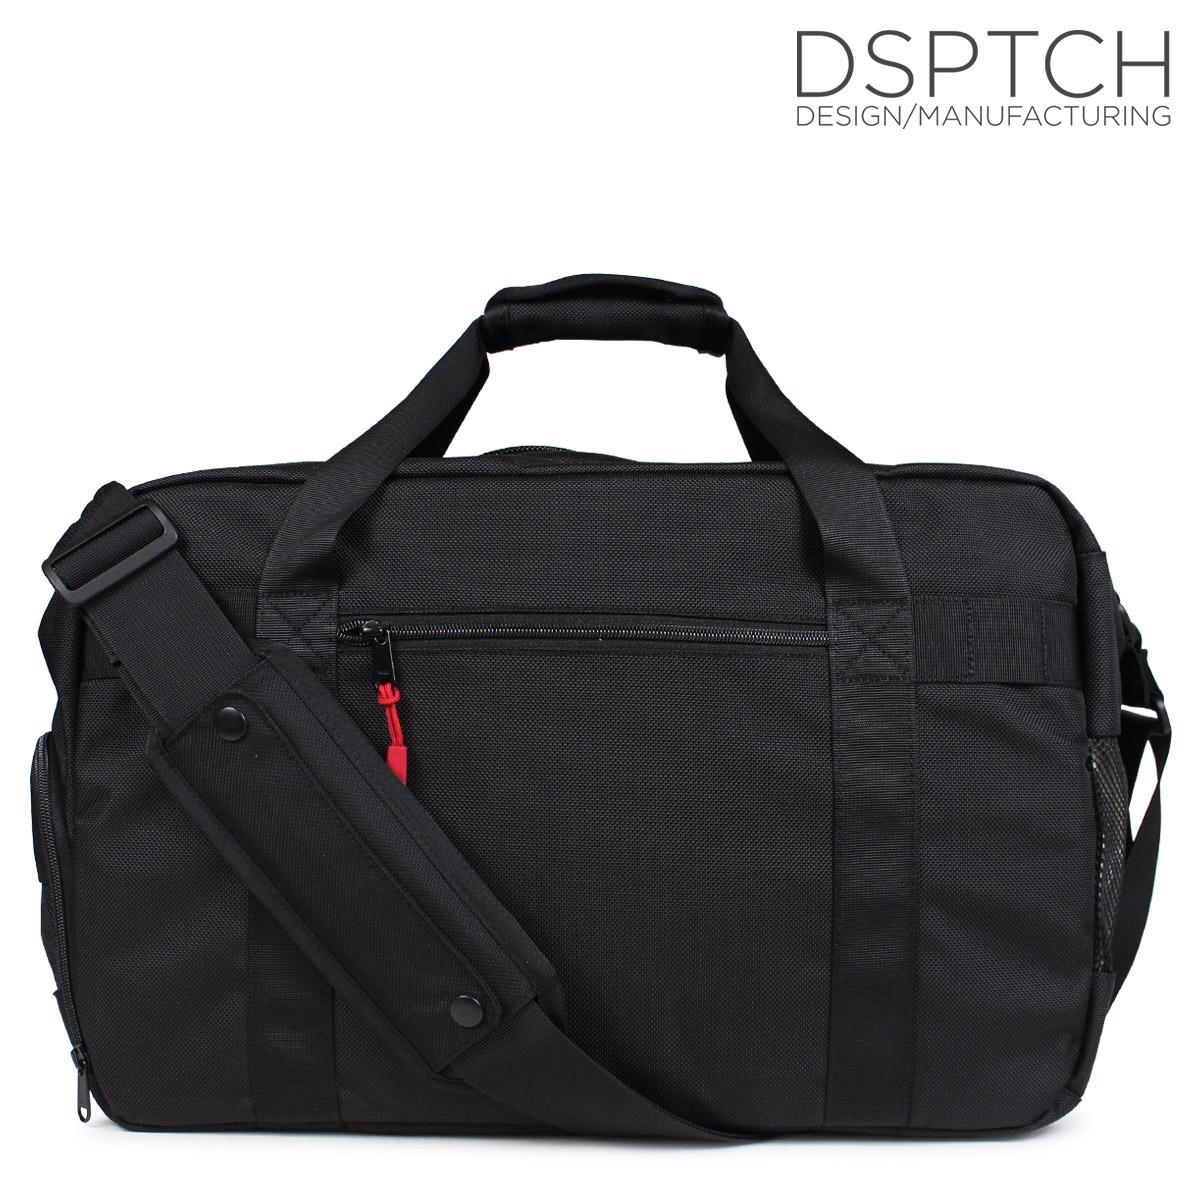 DSPTCH GYM WORK BAG ディスパッチ バッグ ジムバッグ メンズ レディース 23L ブラック PCK-GW [11/20 再入荷]